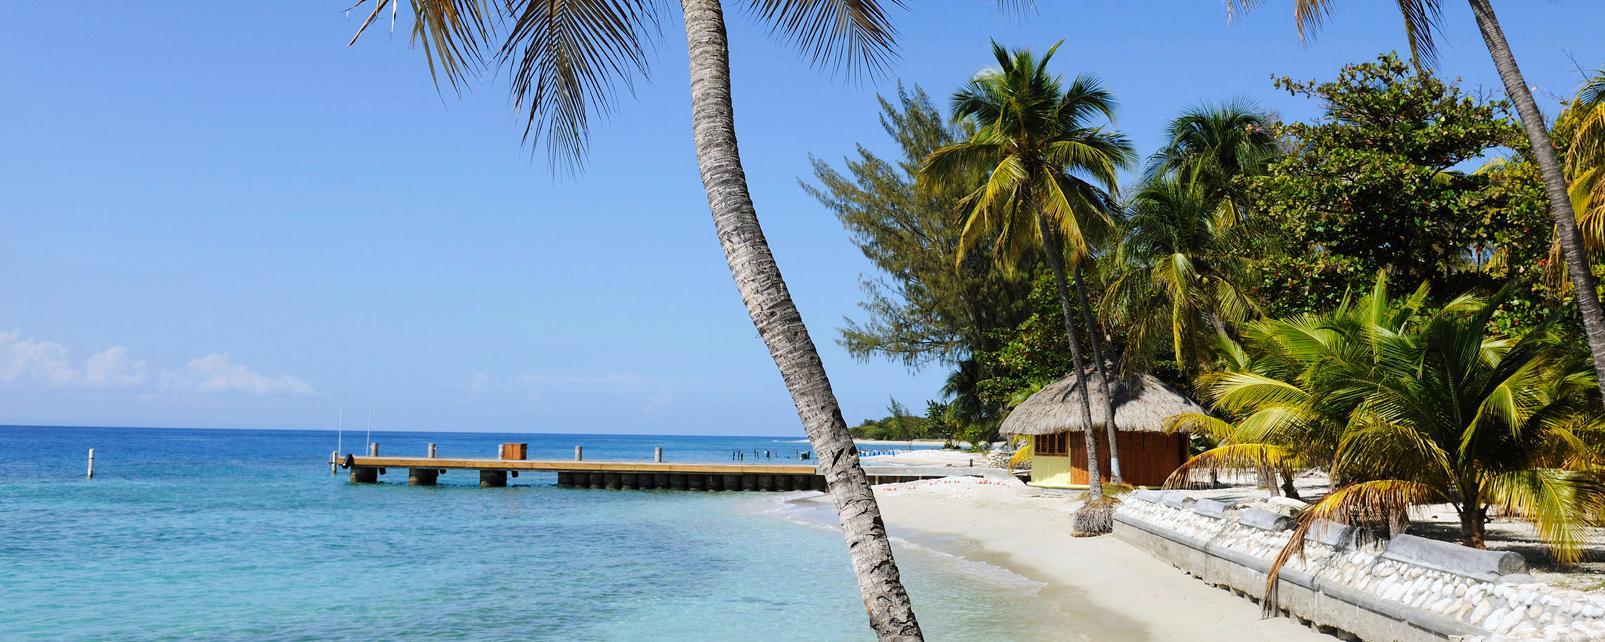 Caraïbes, Haïti, Haiti, plage, baignade, hutte, passerelle, sable, mer, palmier,